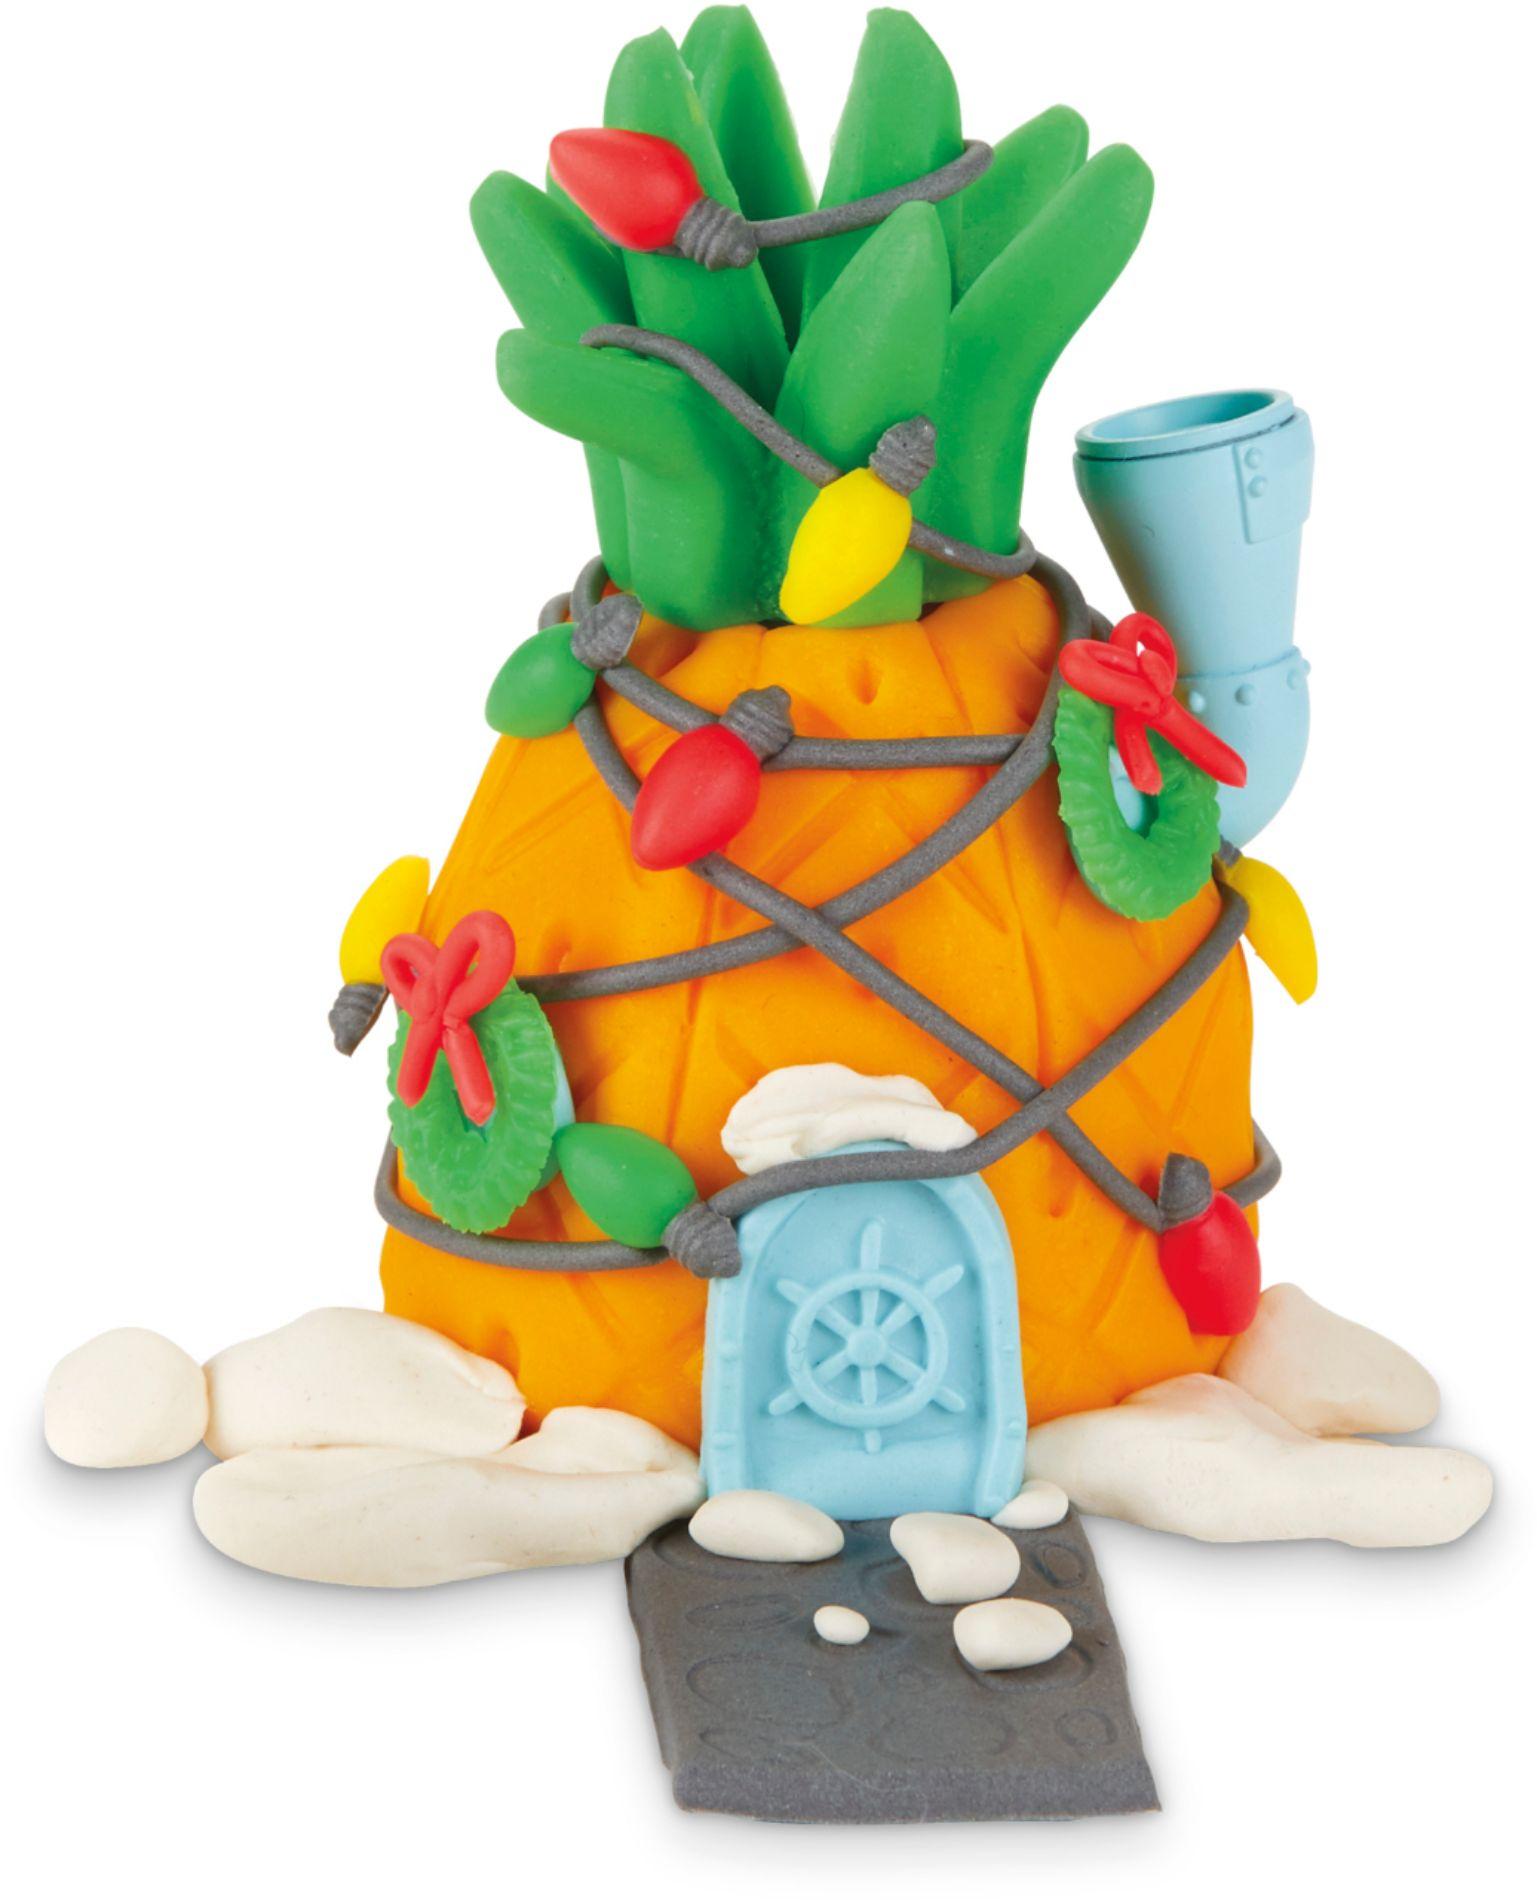 Spongebob Play-doh : spongebob, play-doh, Play-Doh, Builder, SpongeBob, SquarePants, SpongeBob's, Pineapple, House, E9047